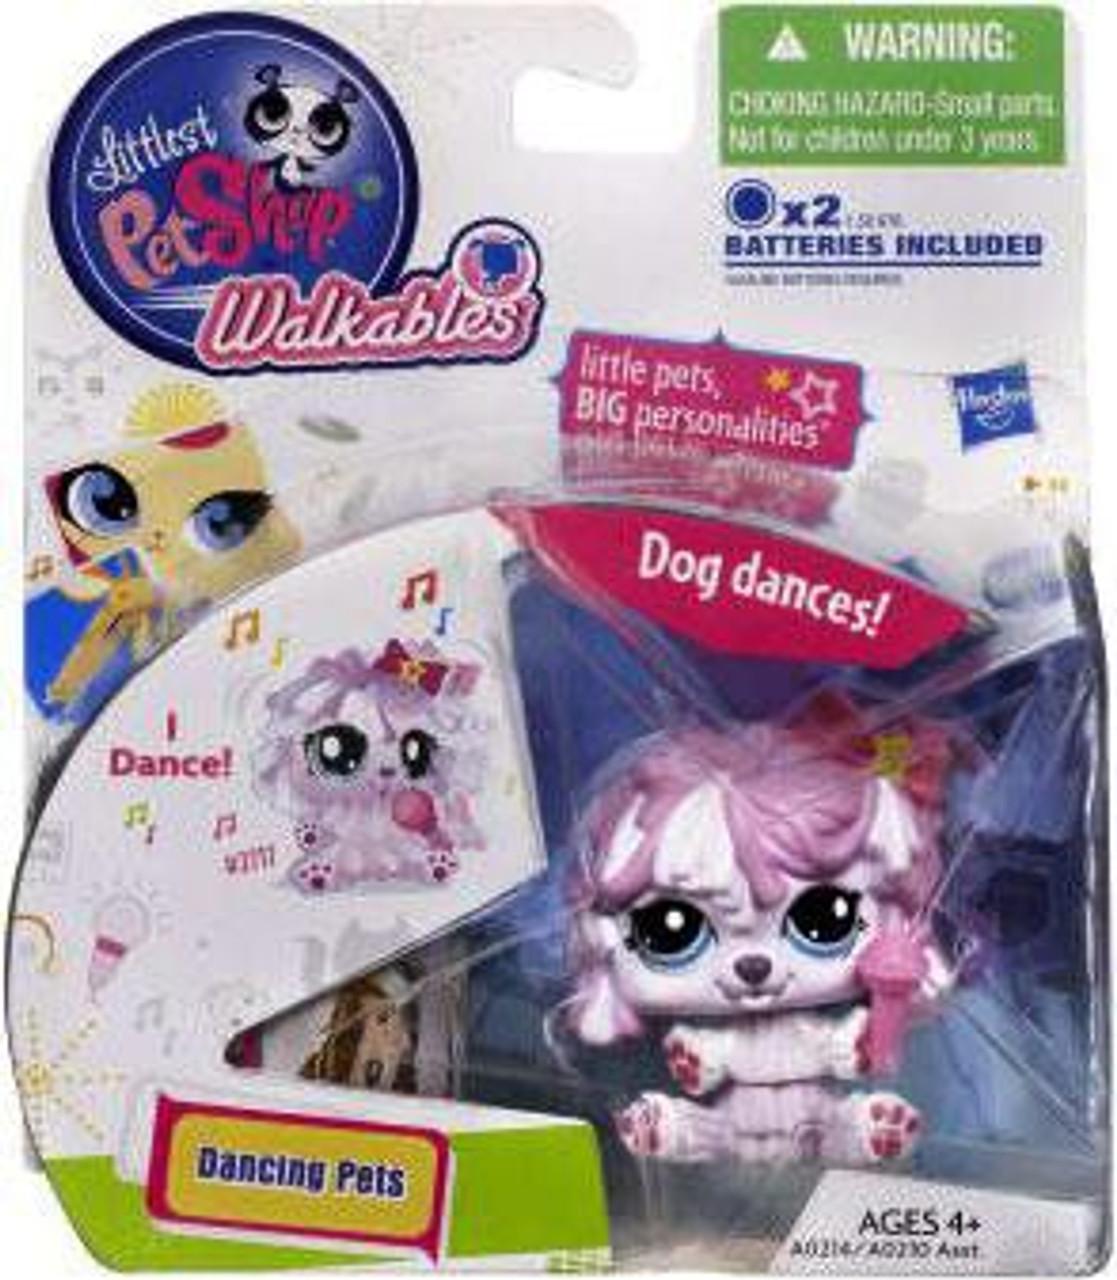 Hasbro Littlest Pet Shop Walkables Dancing Pets Ostrich Figure